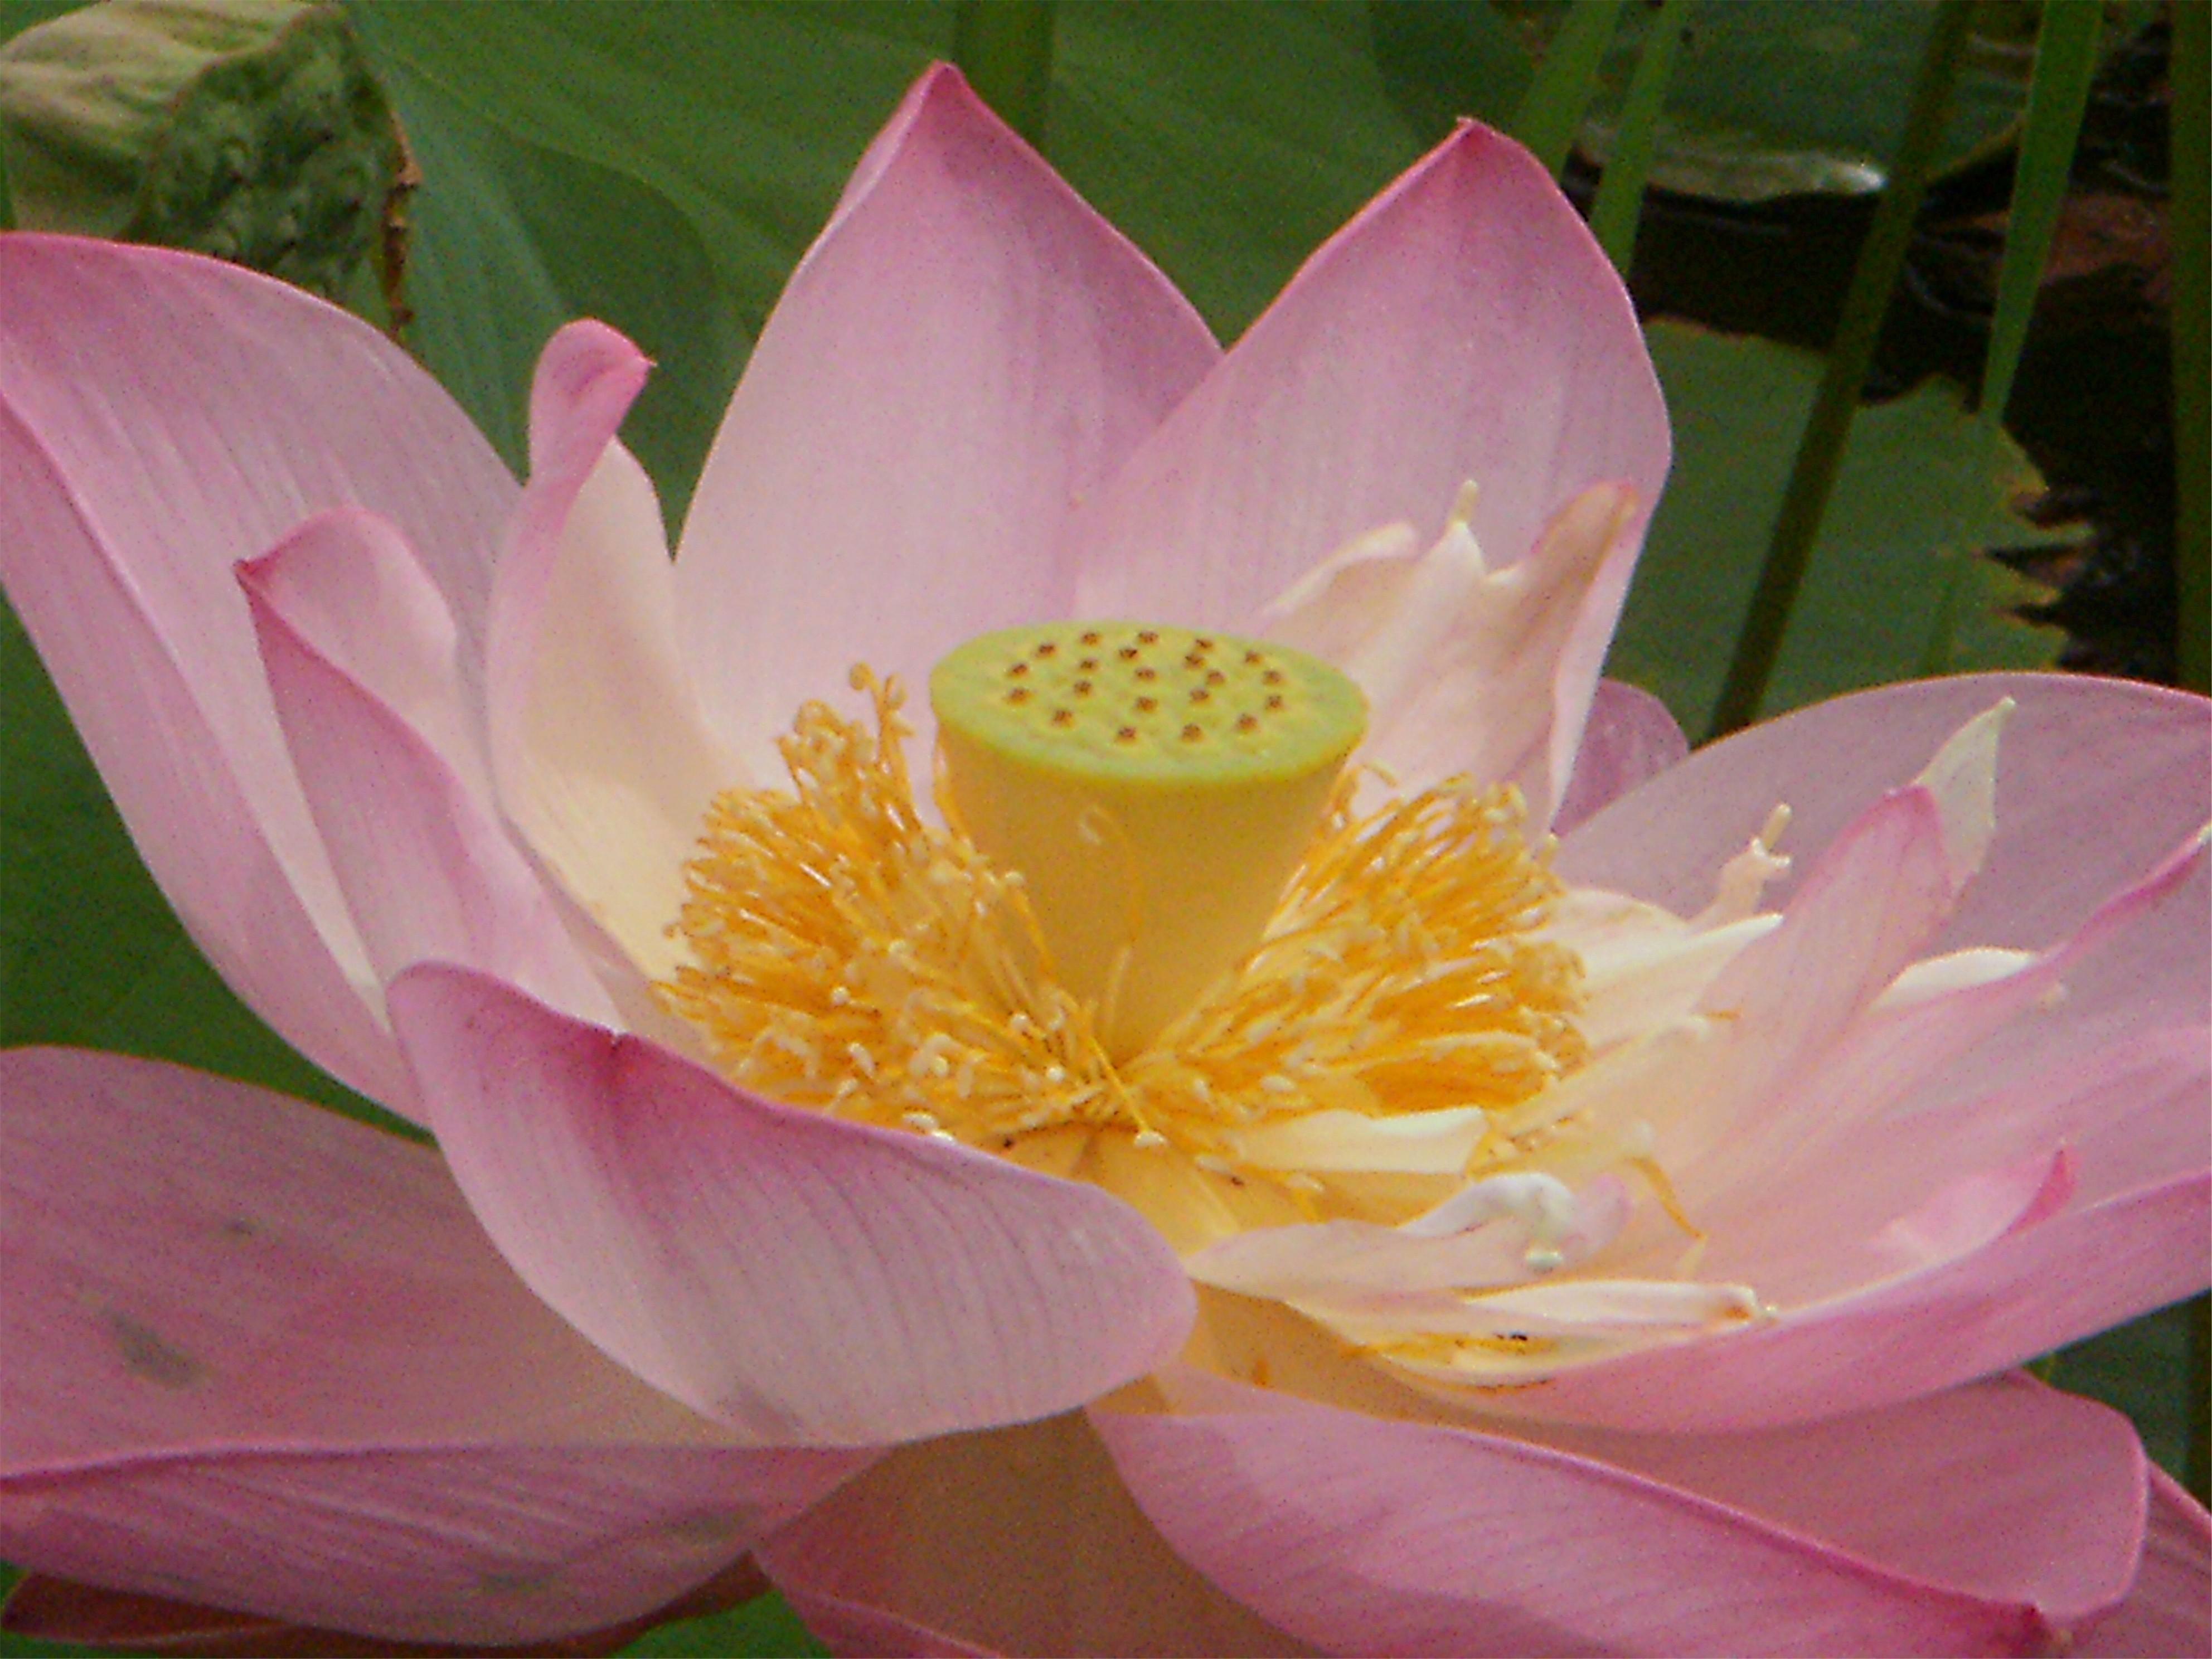 Fondos De Pantalla Rosado Flor Asiático Lirio De Agua Loto